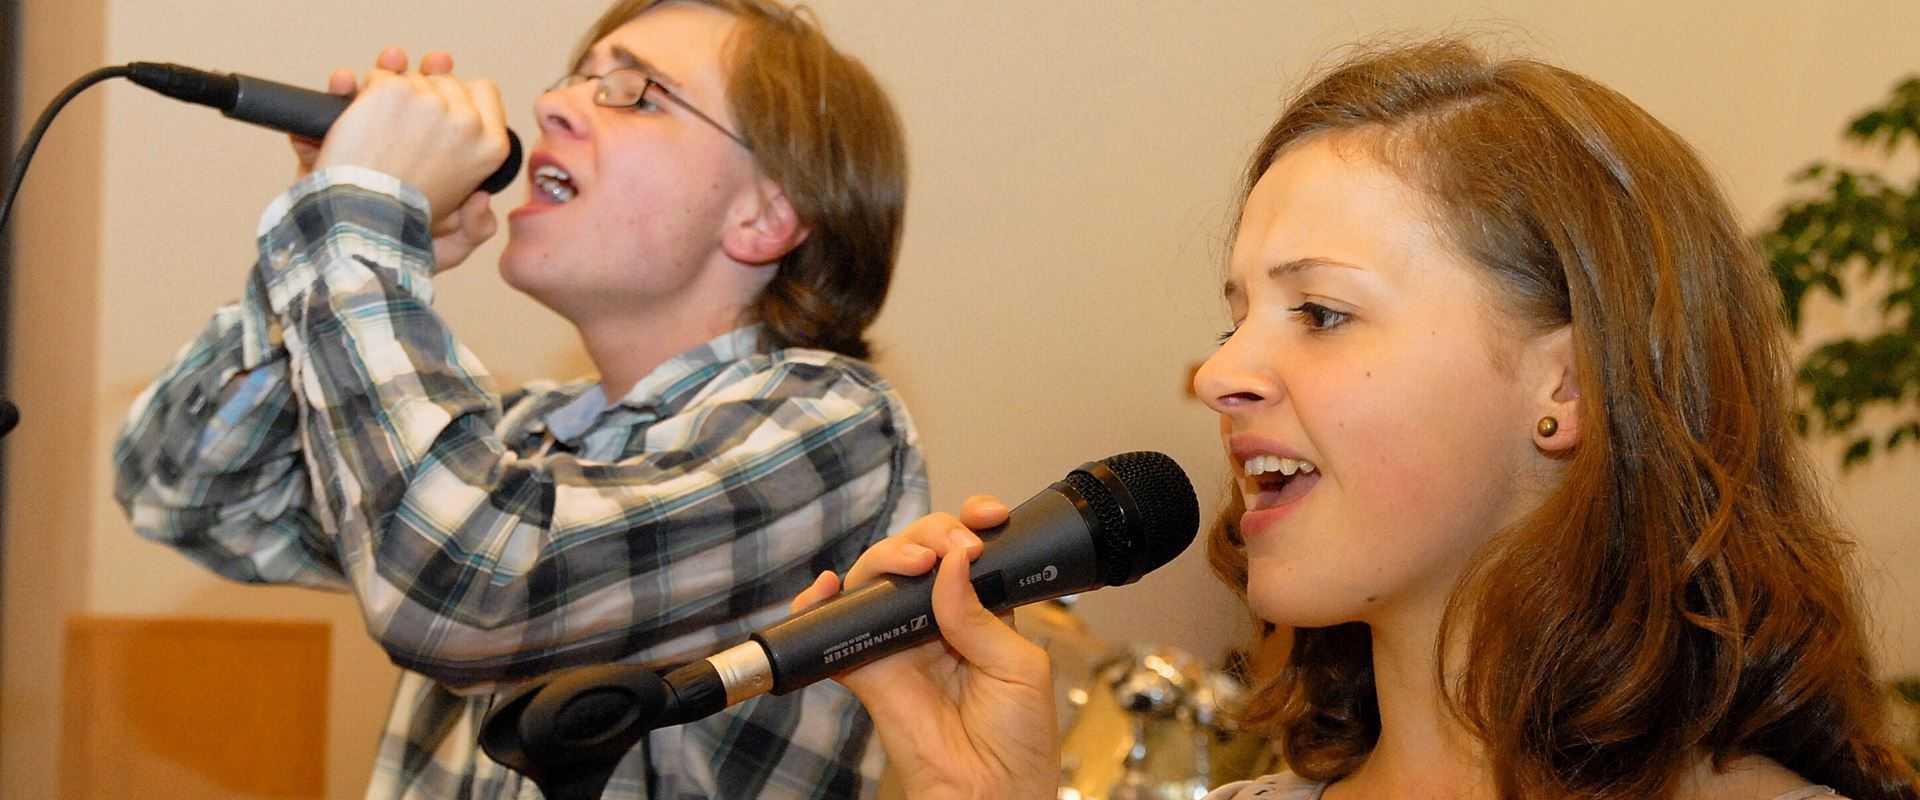 Gesangsunterricht in der Musikschule Bertheau & Morgenstern